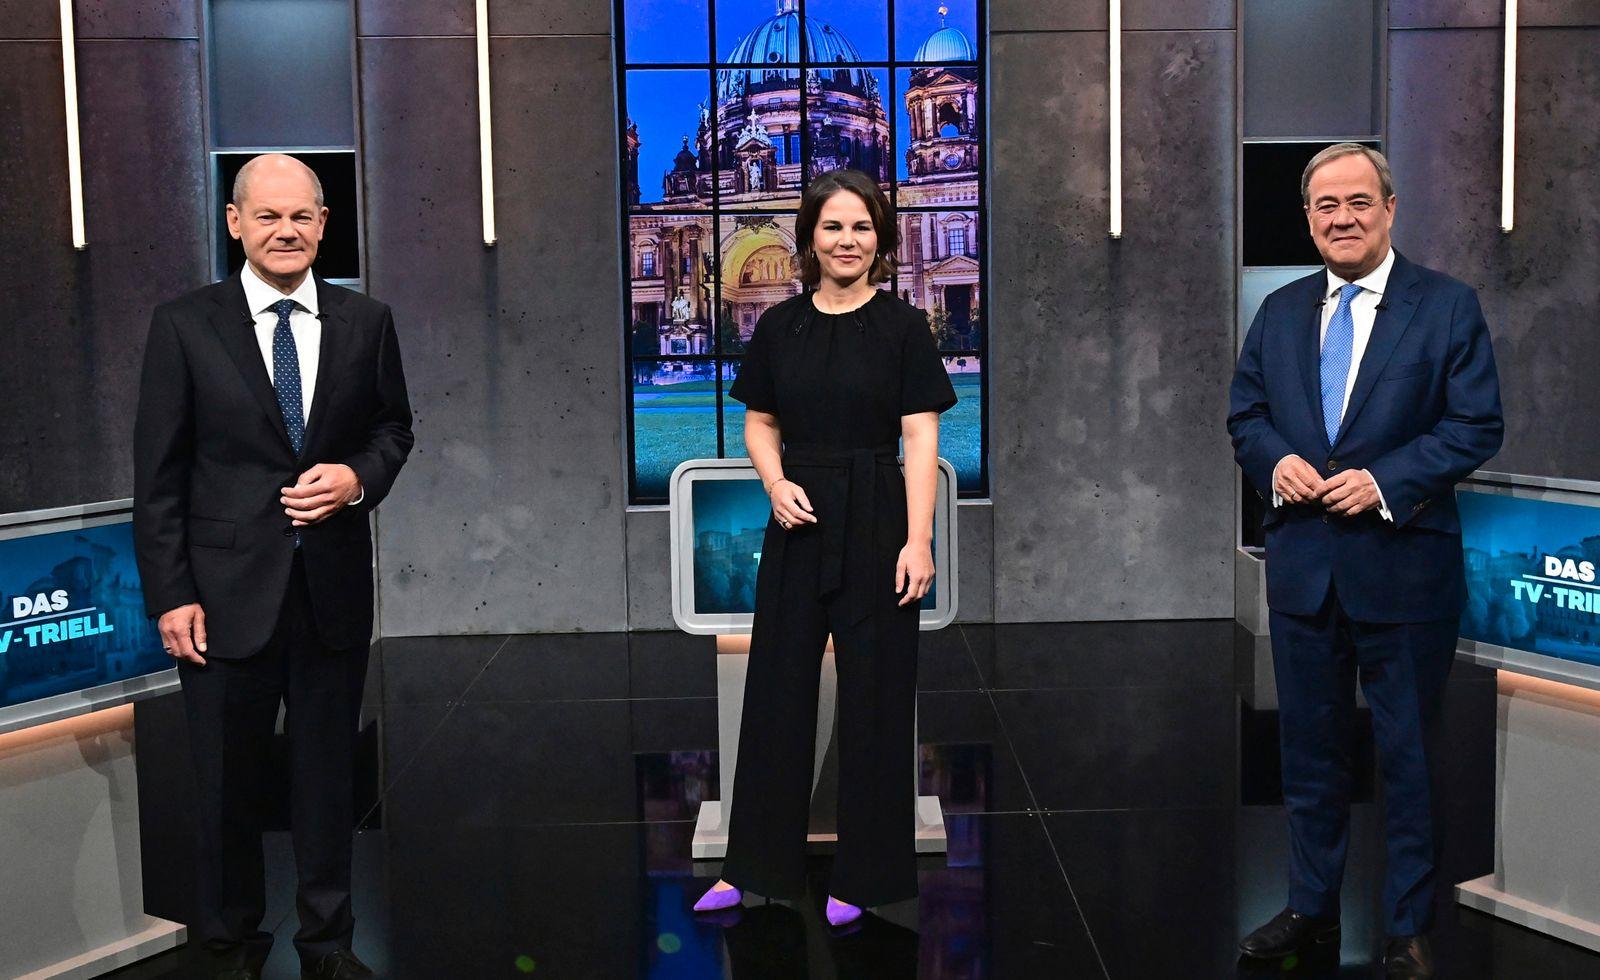 GERMANY-POLITICS-PARTIES-ELECTION-TV-DEBATE